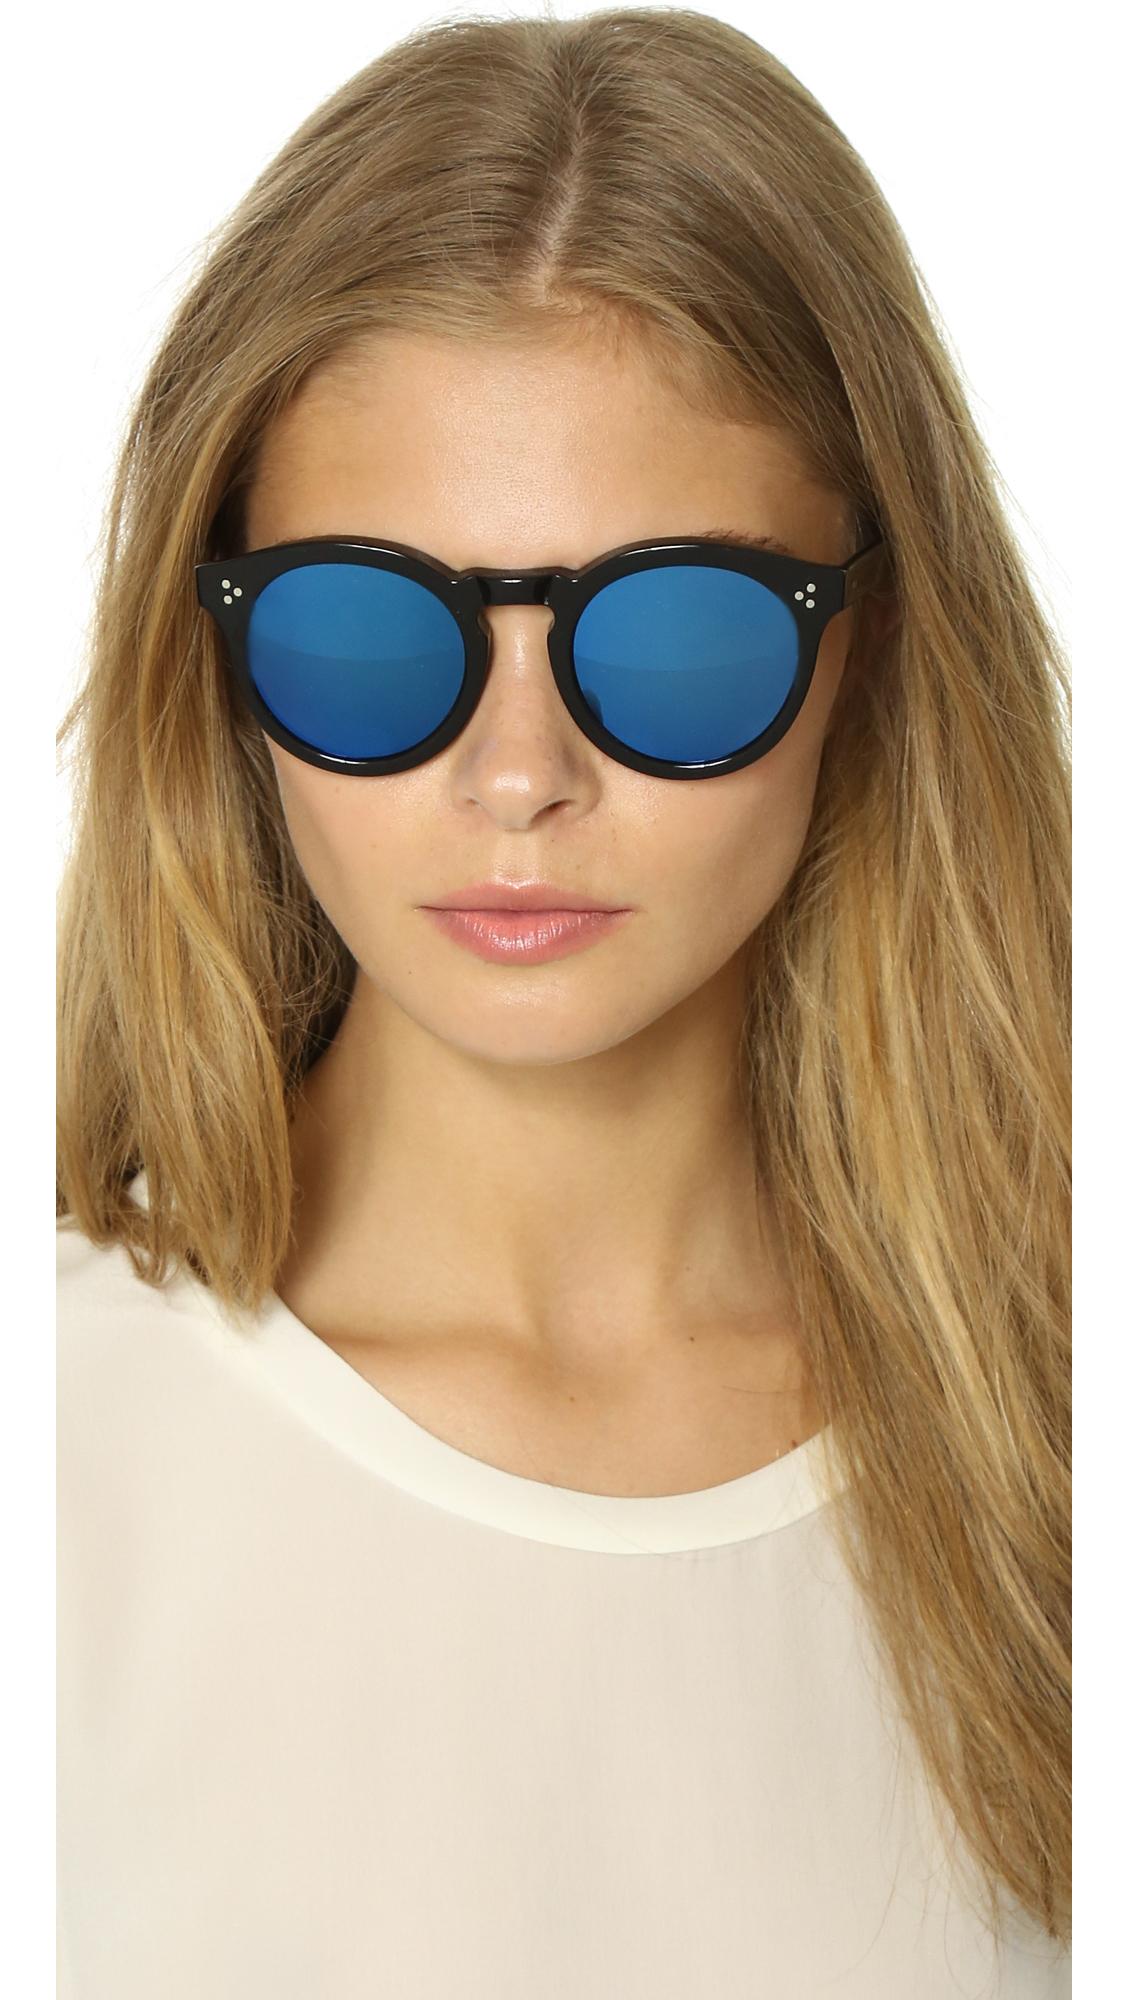 d486a33613 Lyst - Illesteva Leonard Ii Mirrored Sunglasses - Black blue in Blue